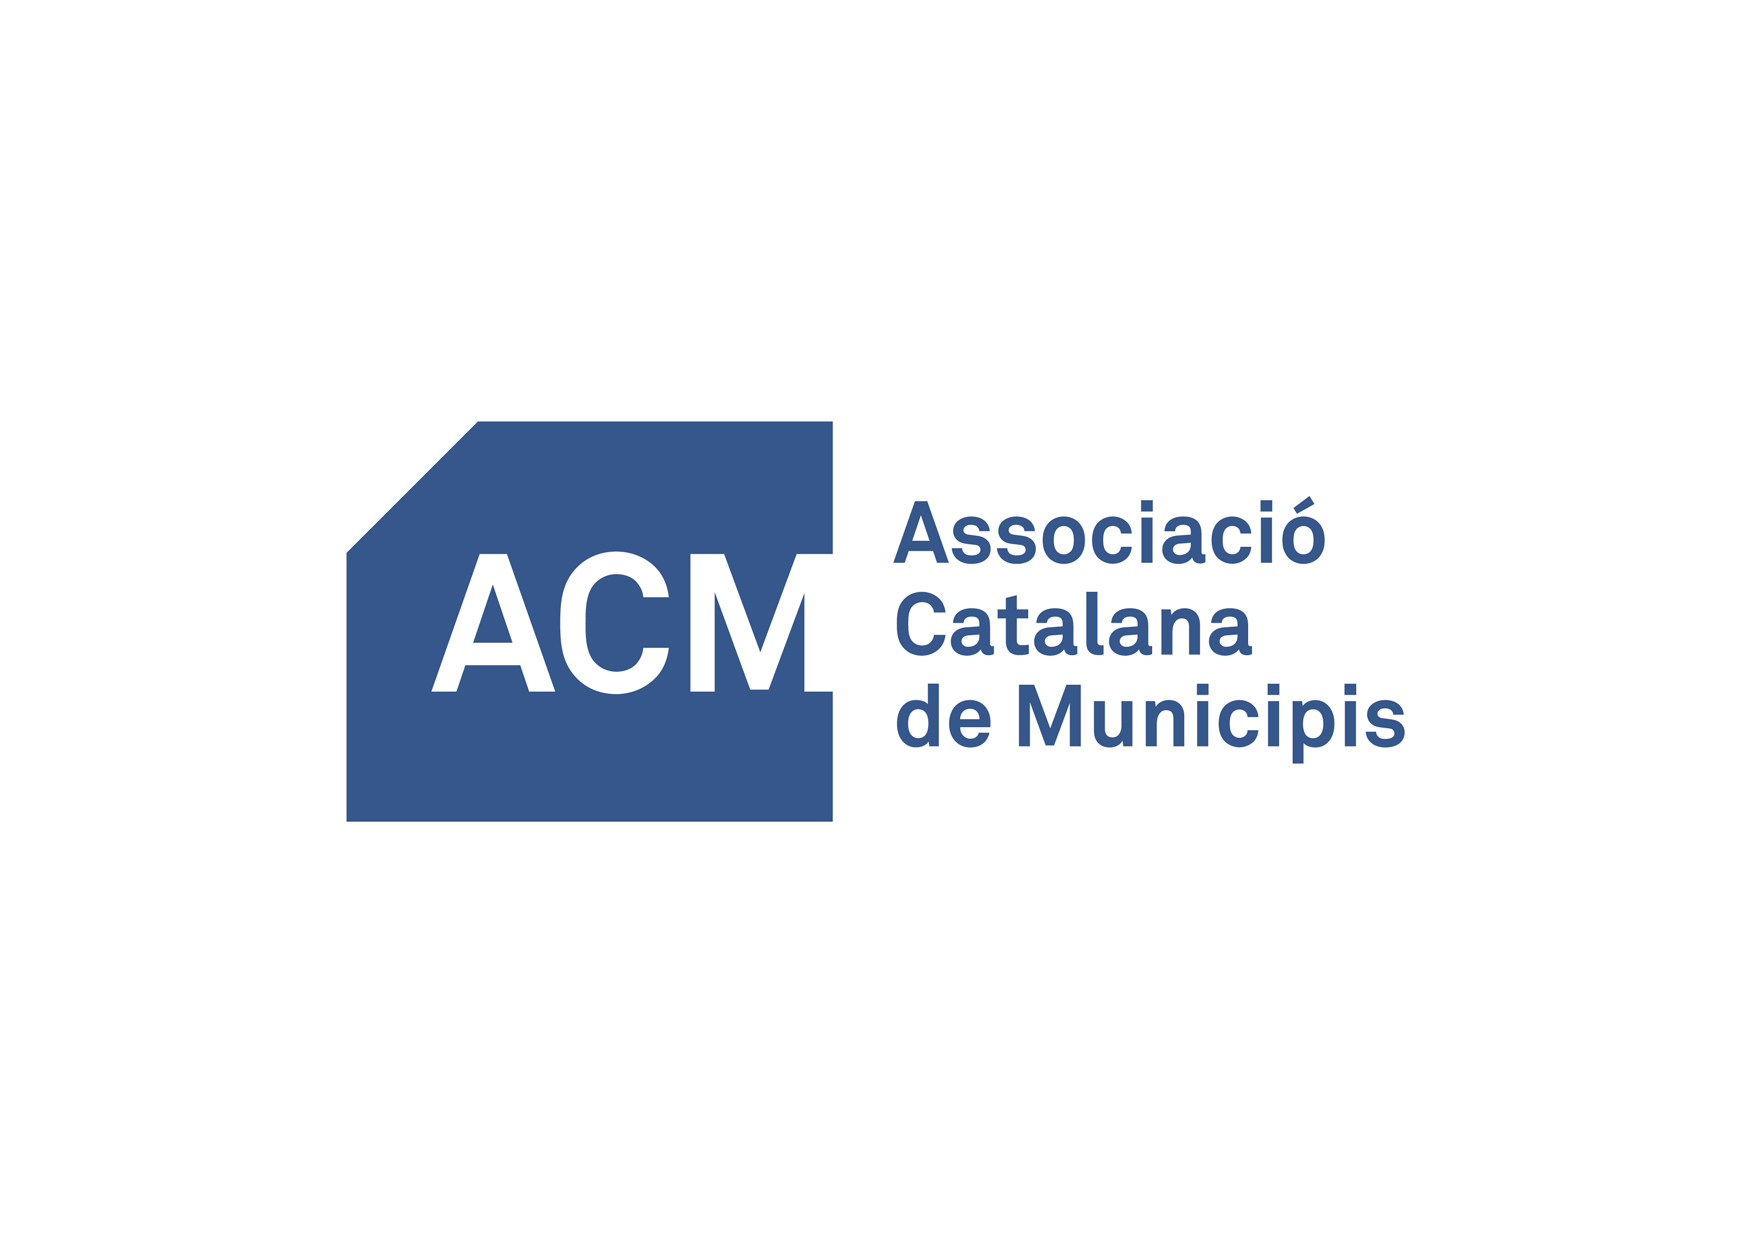 Logotip ACM